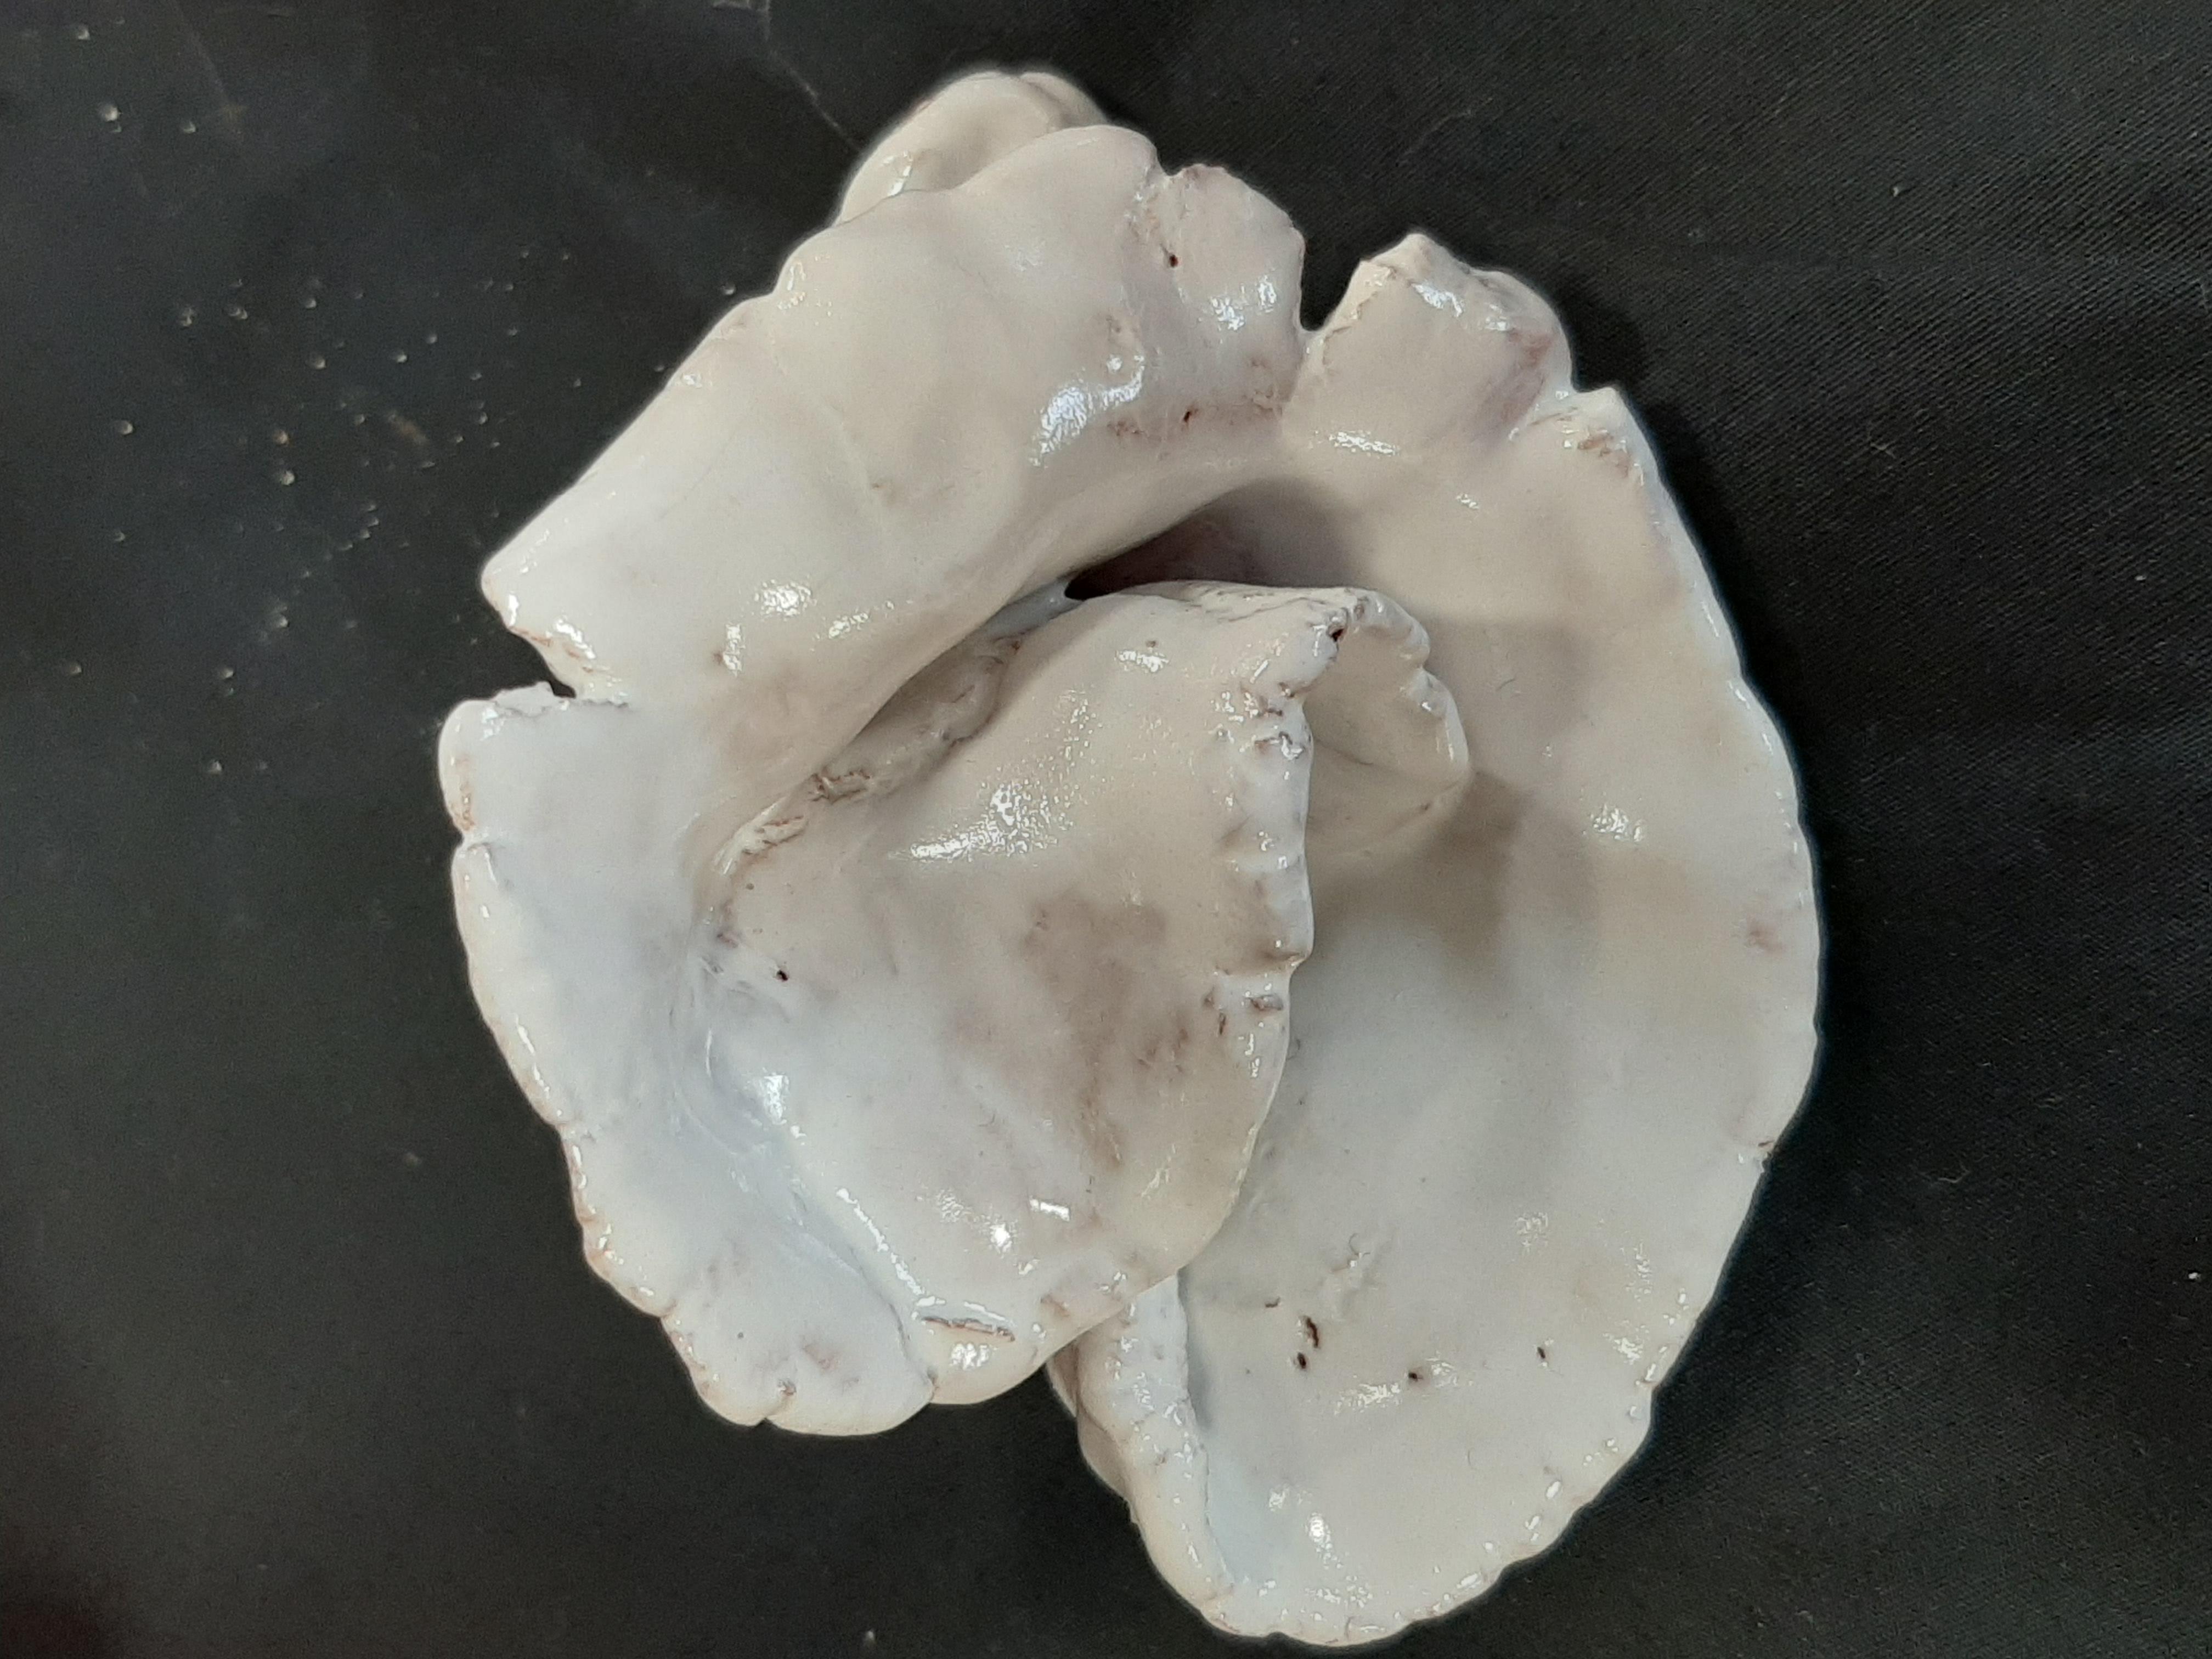 Clay organics